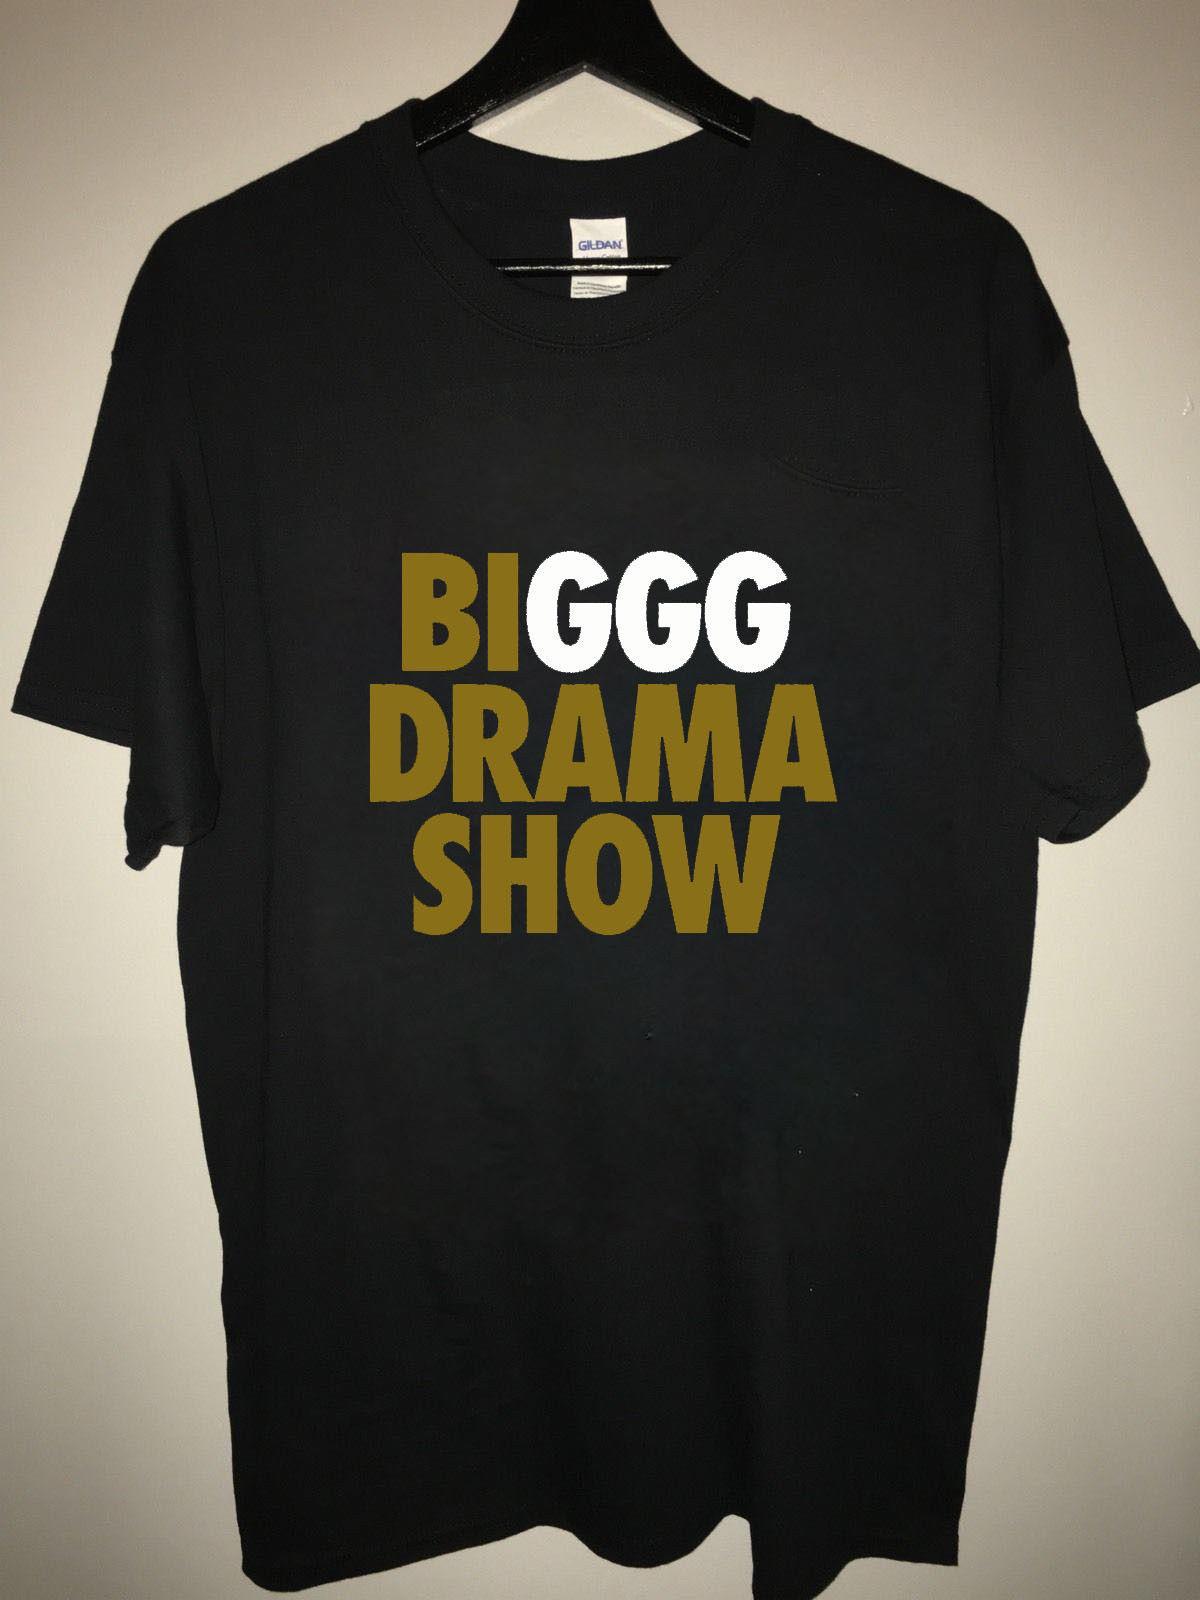 2352bf3699a5aa Custom Ggg Black T Shirt Biggg Drama Show Gennady Golovkin Cool Casual  Pride T Shirt Men Unisex New Fashion Tshirt Loose Size Shirt Shirts Buy  Tees From ...